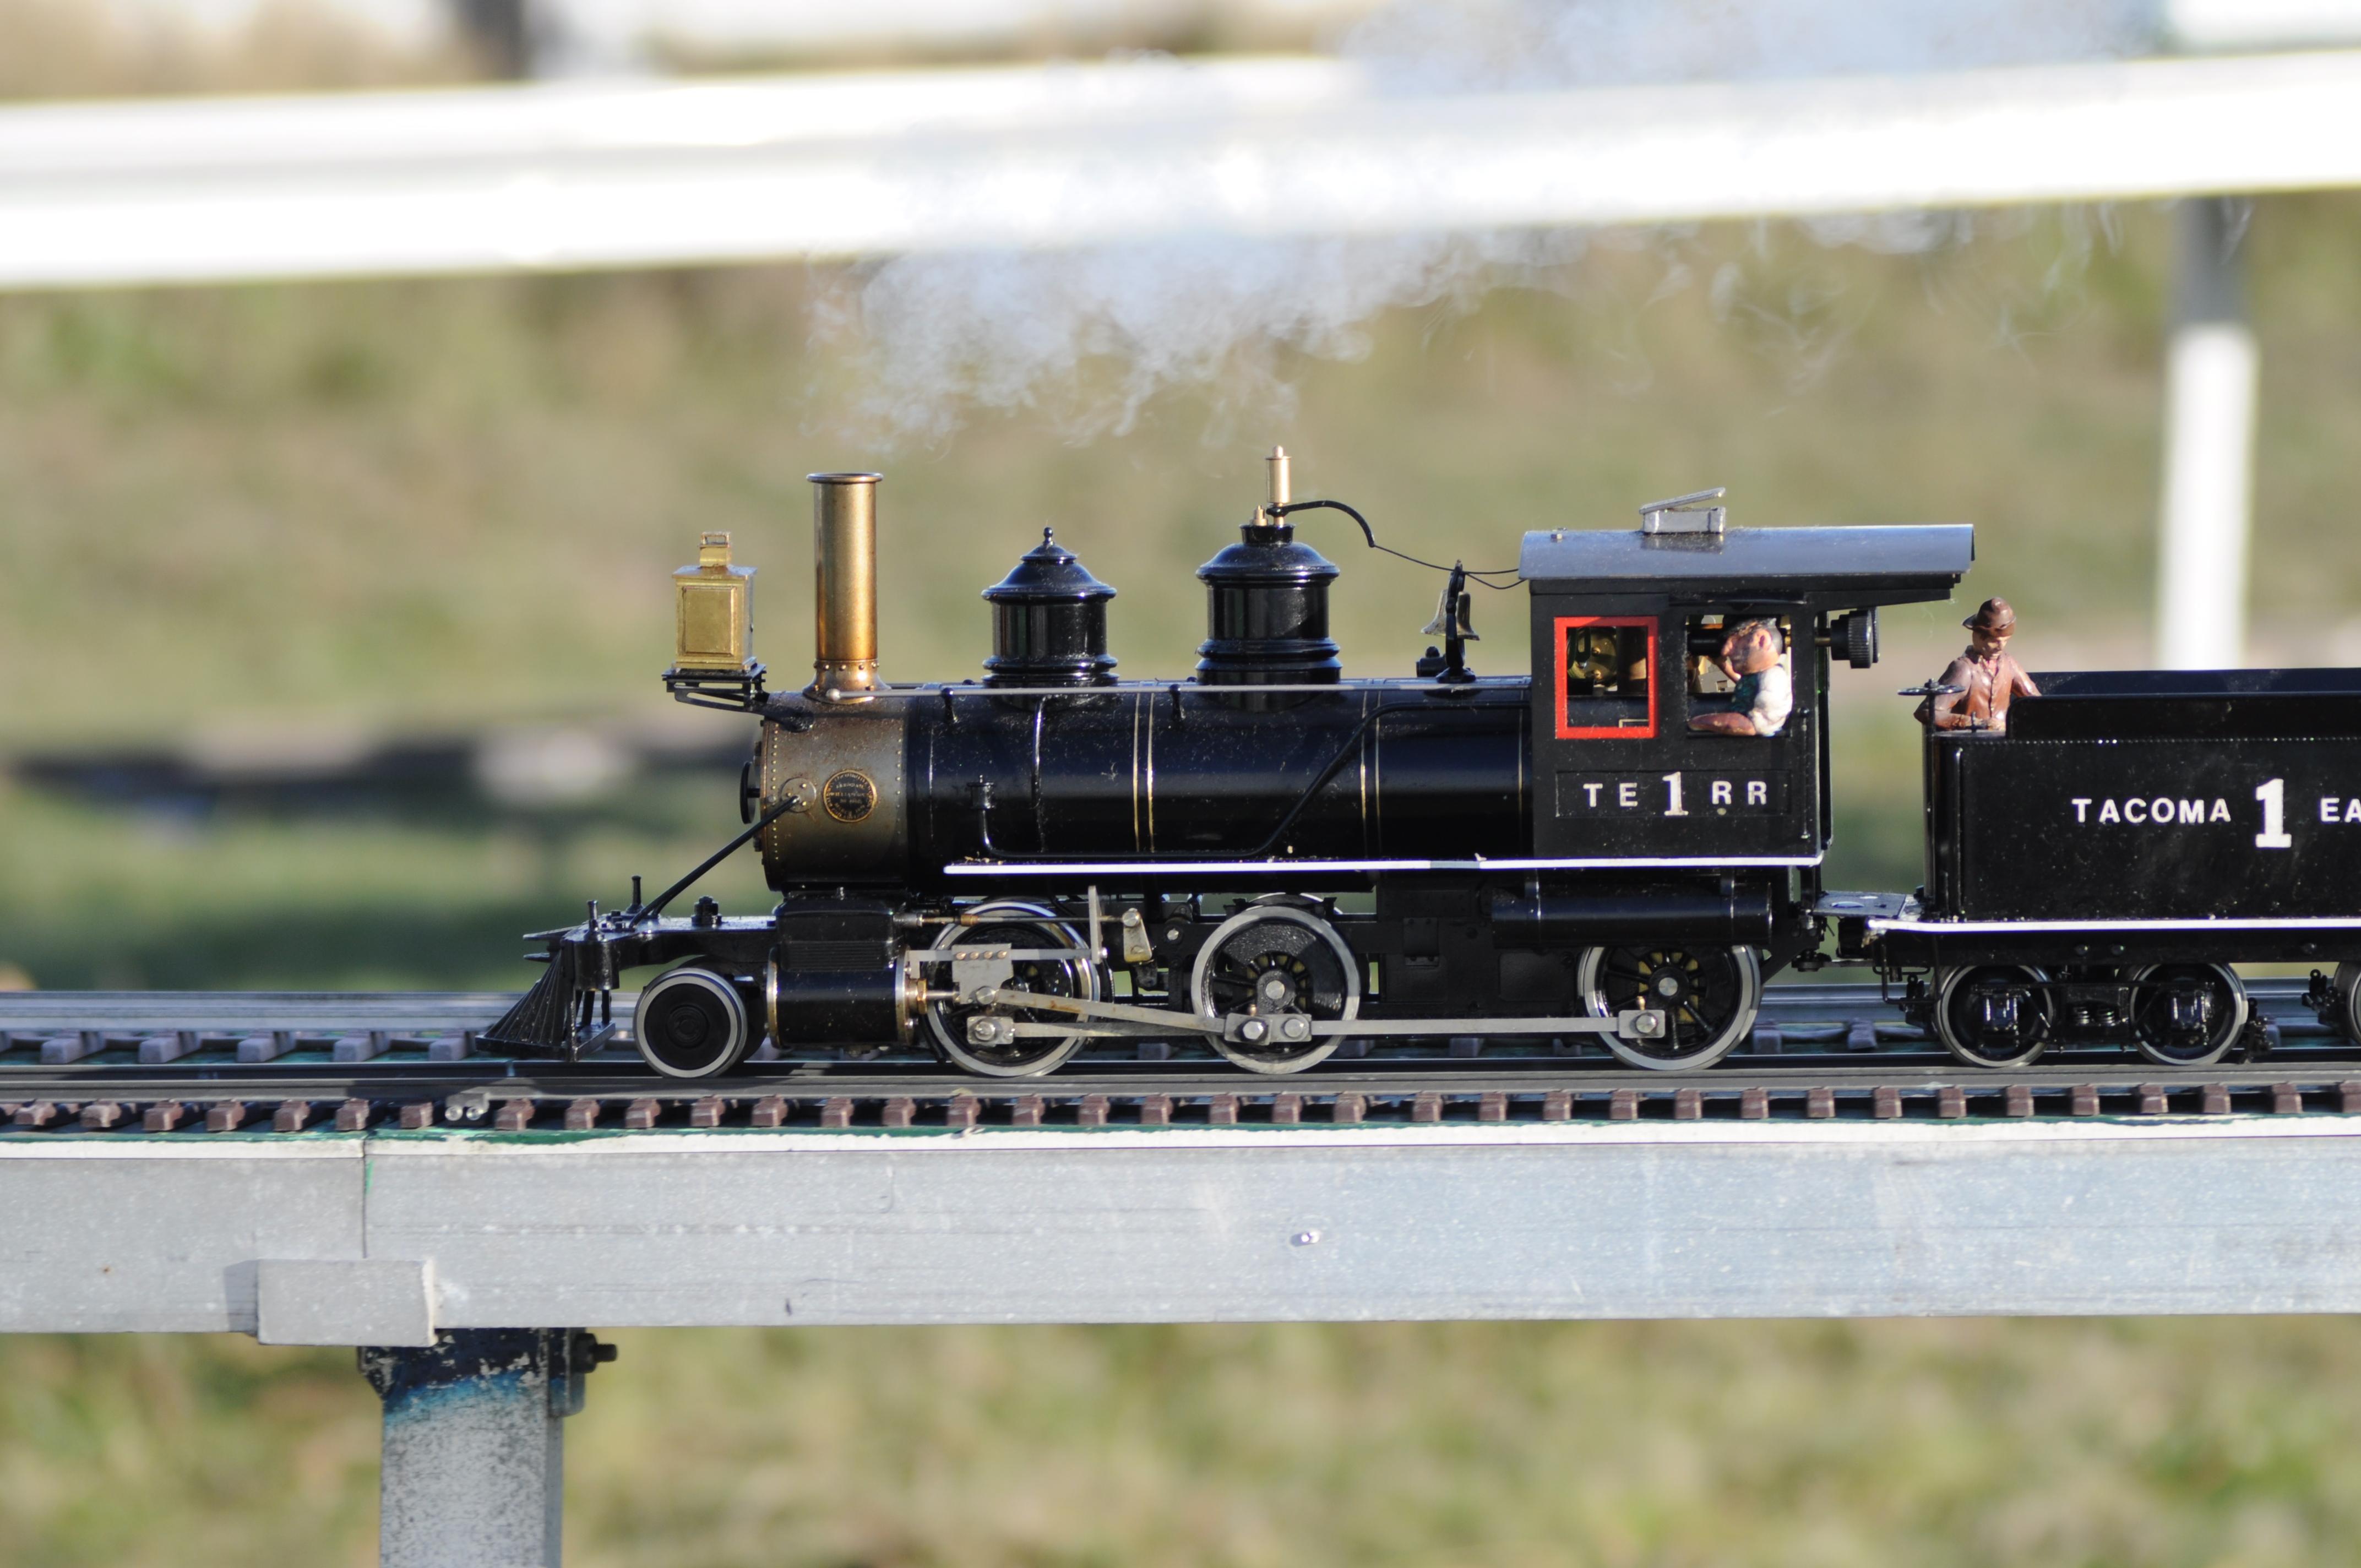 Model steam train engines